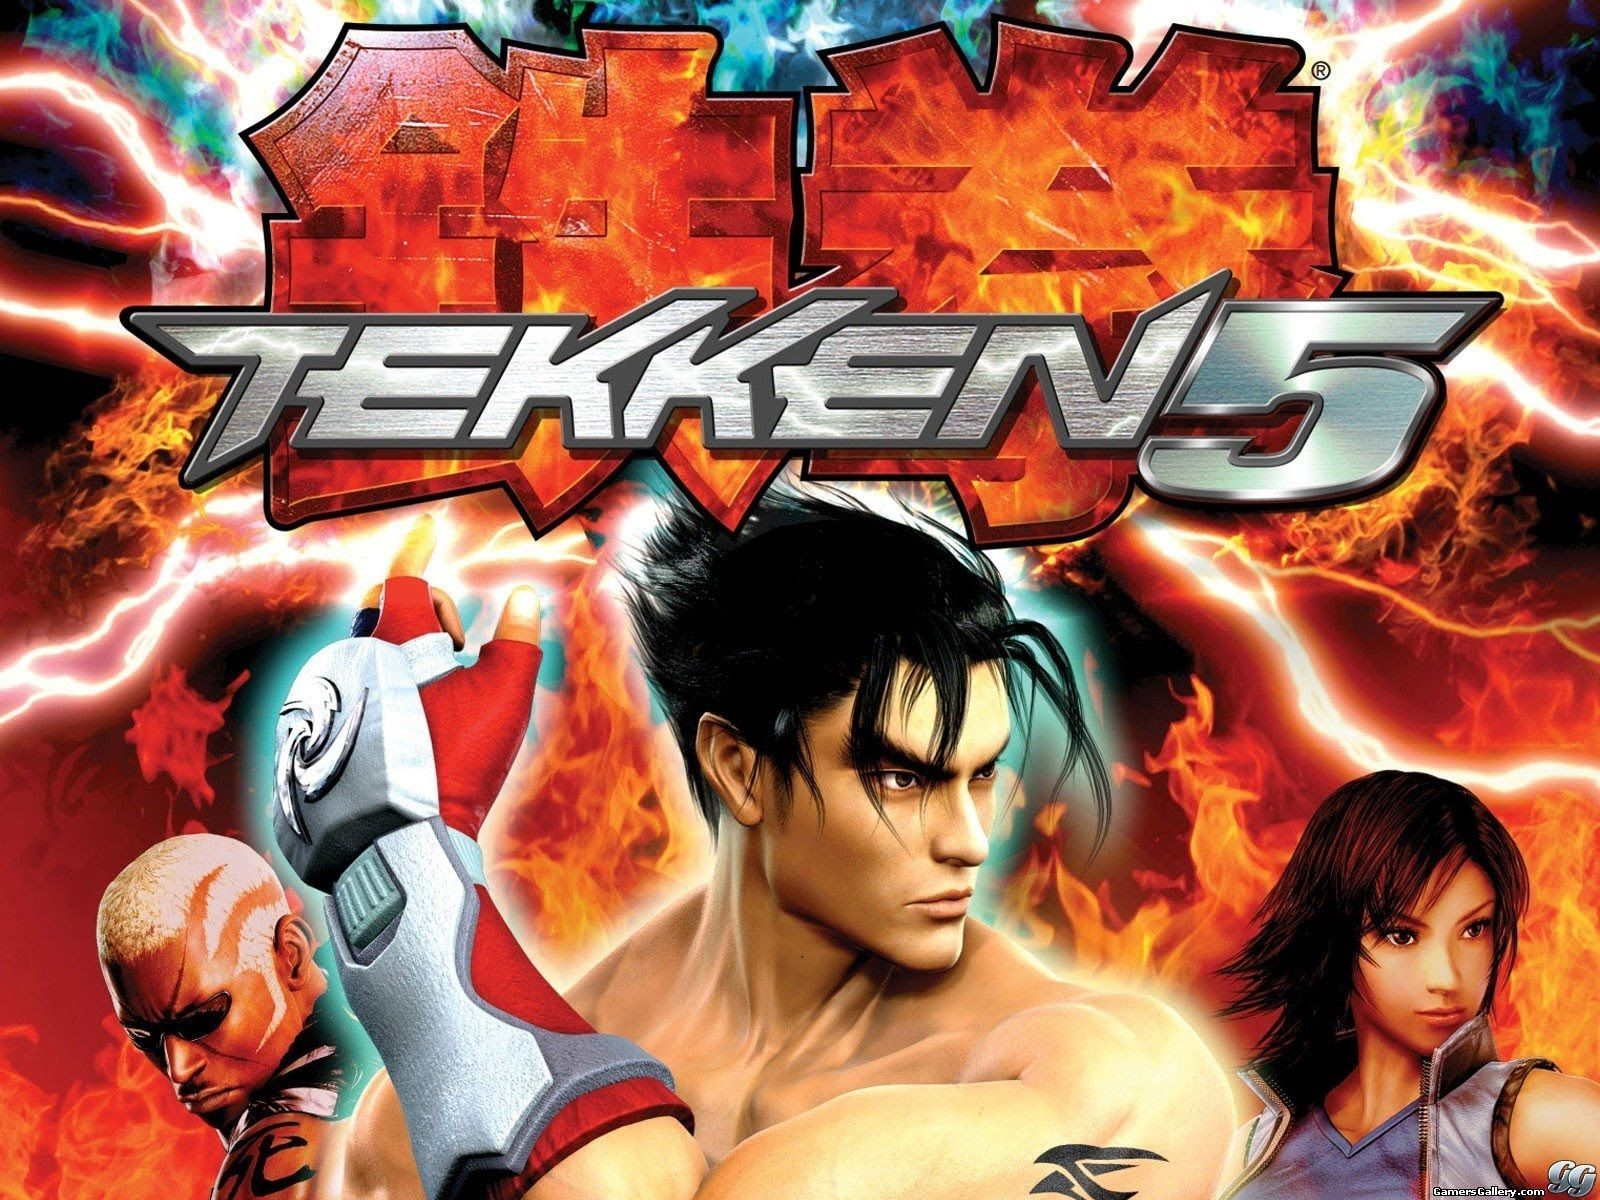 tekken 5 pc game download free full version compressed dlc games